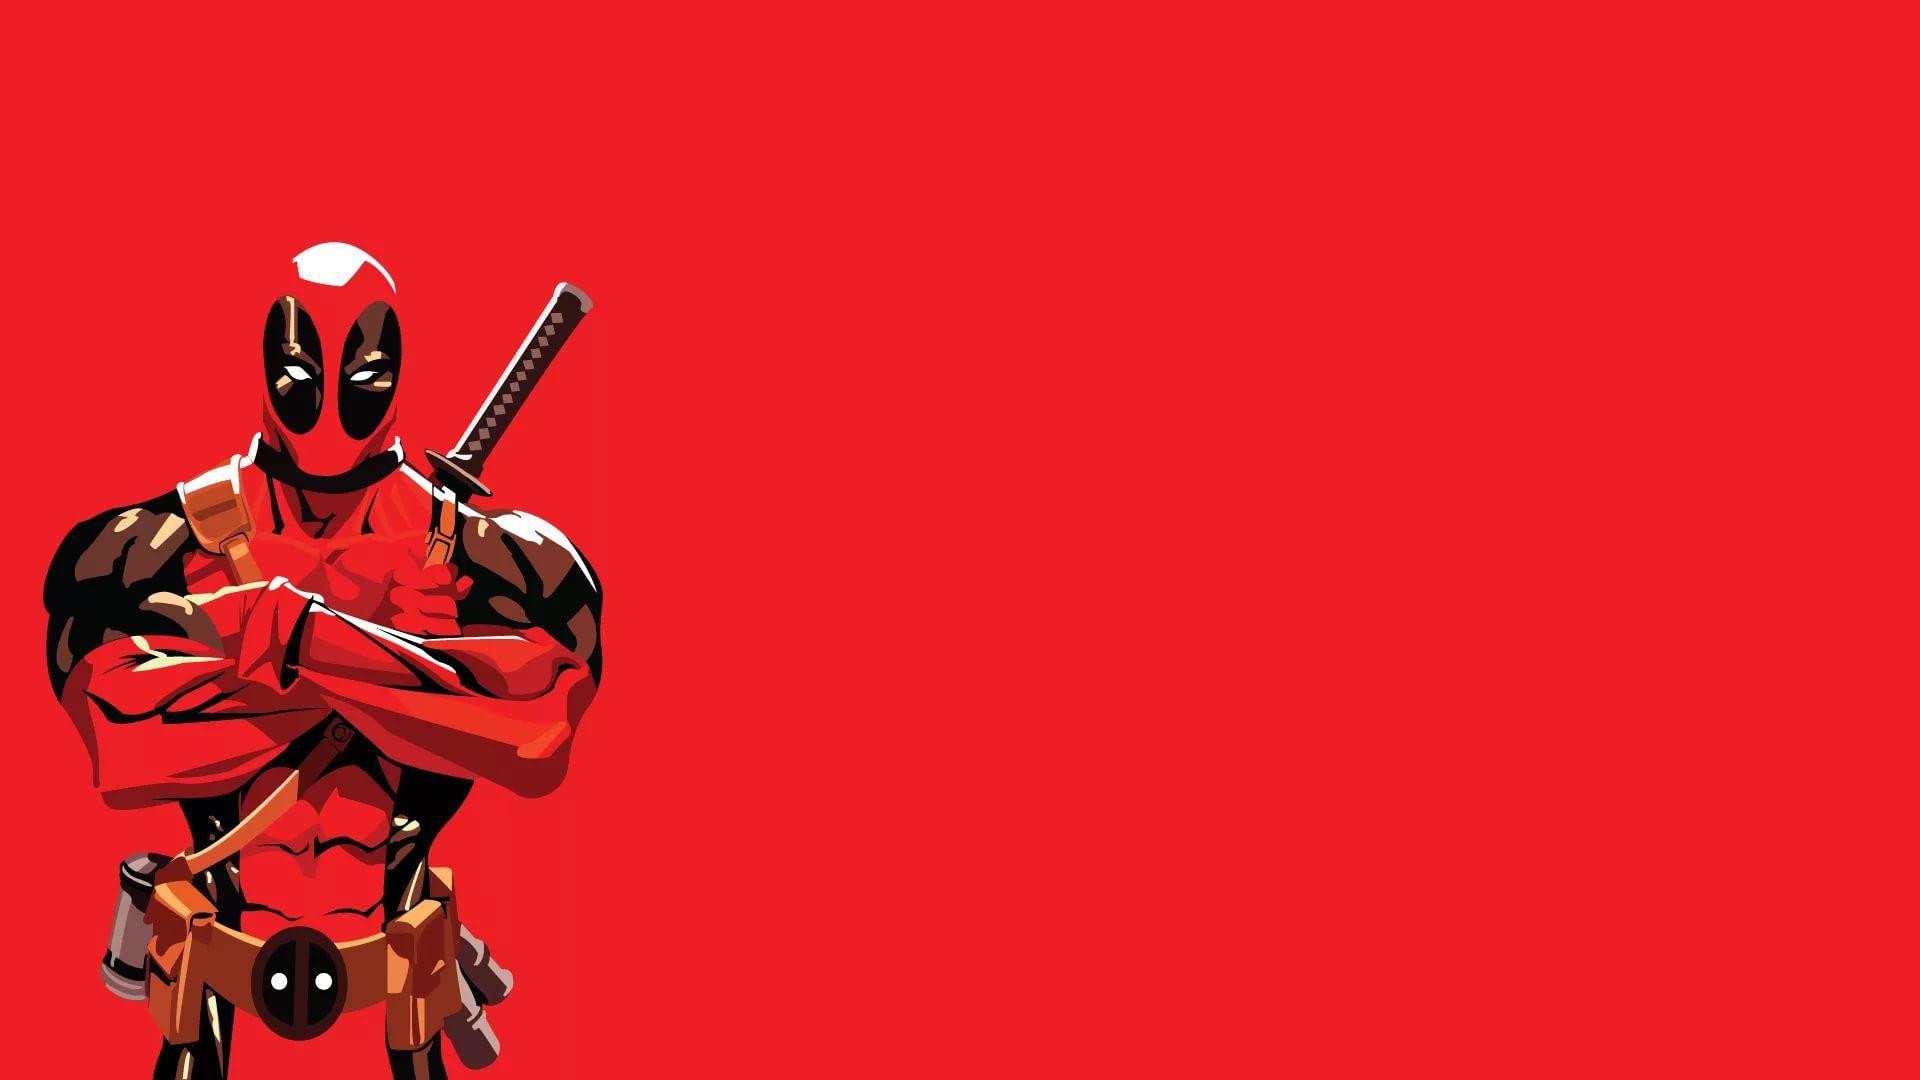 Cool Deadpool wallpaper image